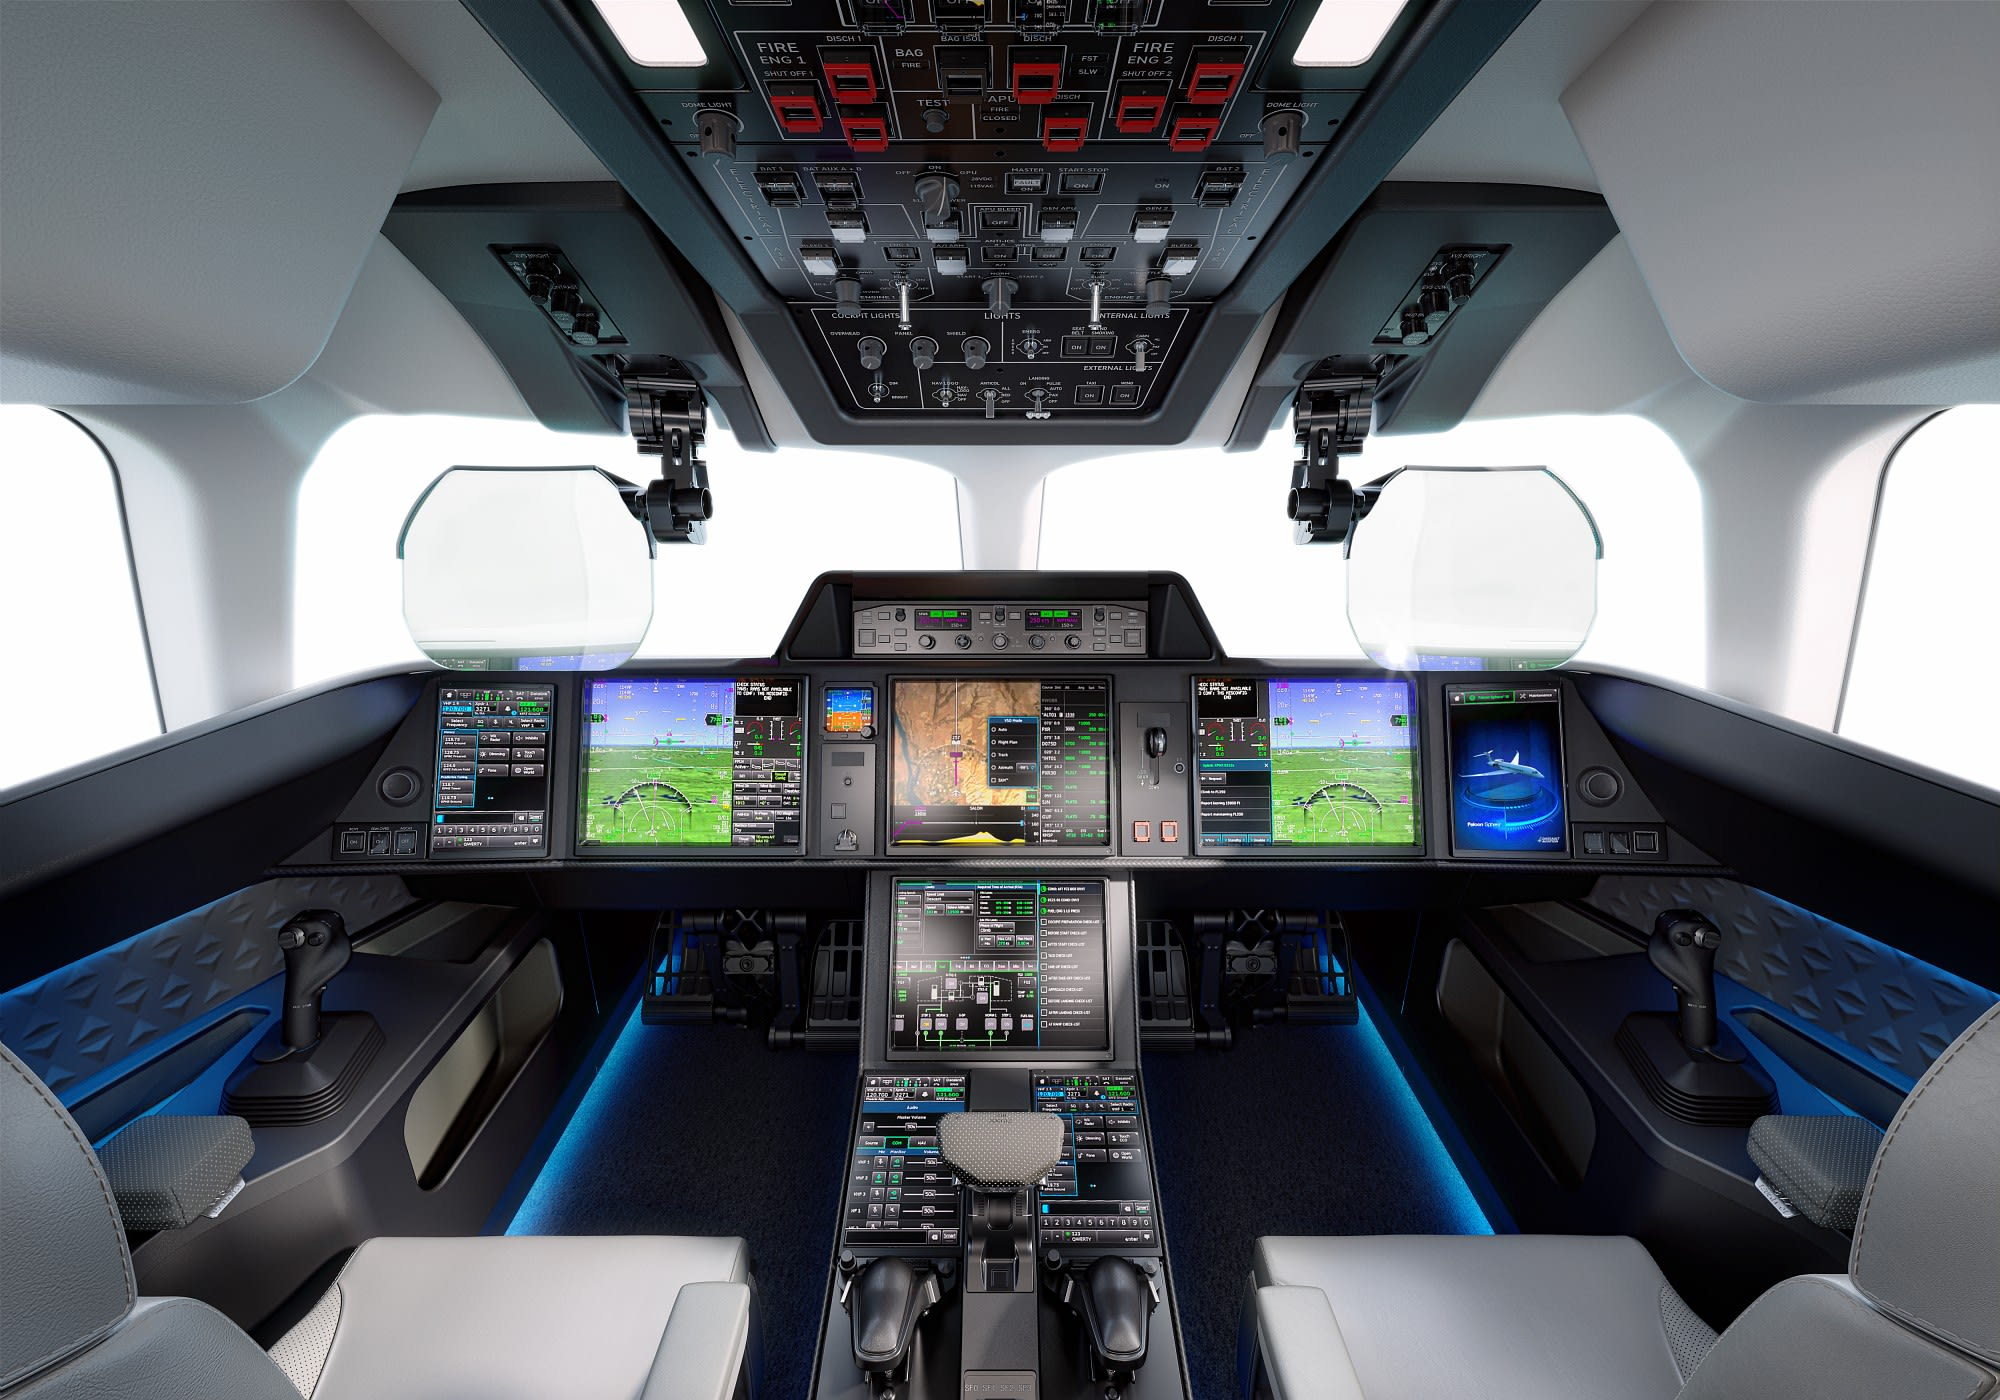 Falcon 10X's flight deck